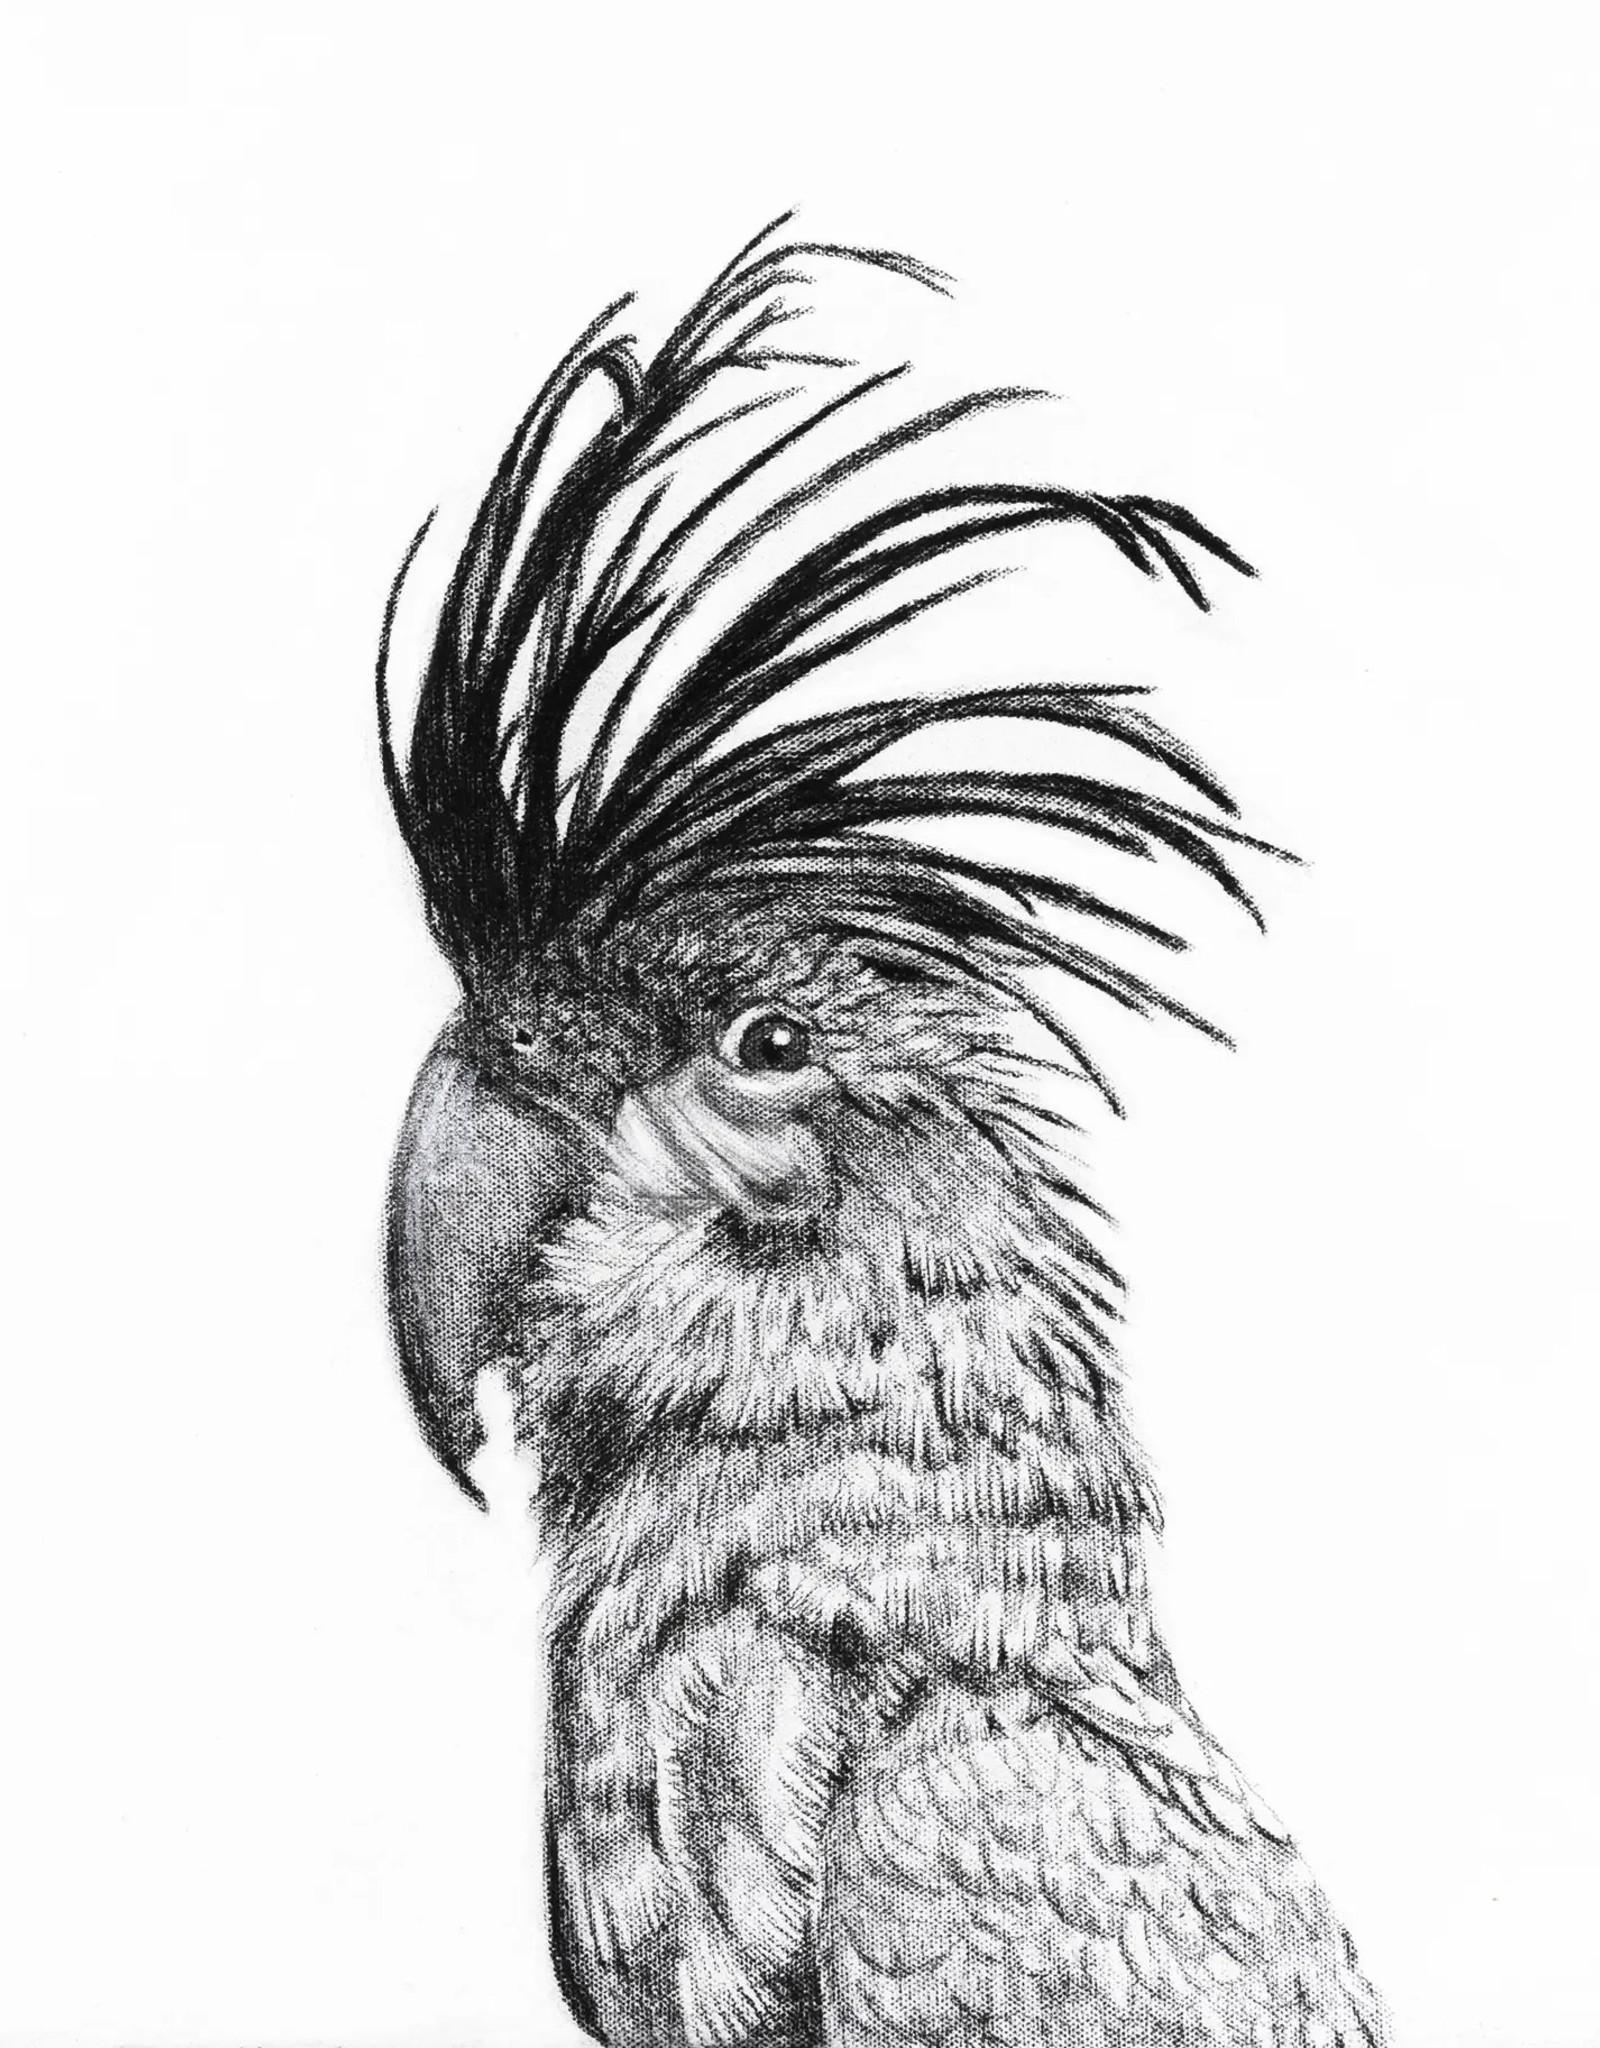 Le Nid - Cockatoo Portrait  12x18